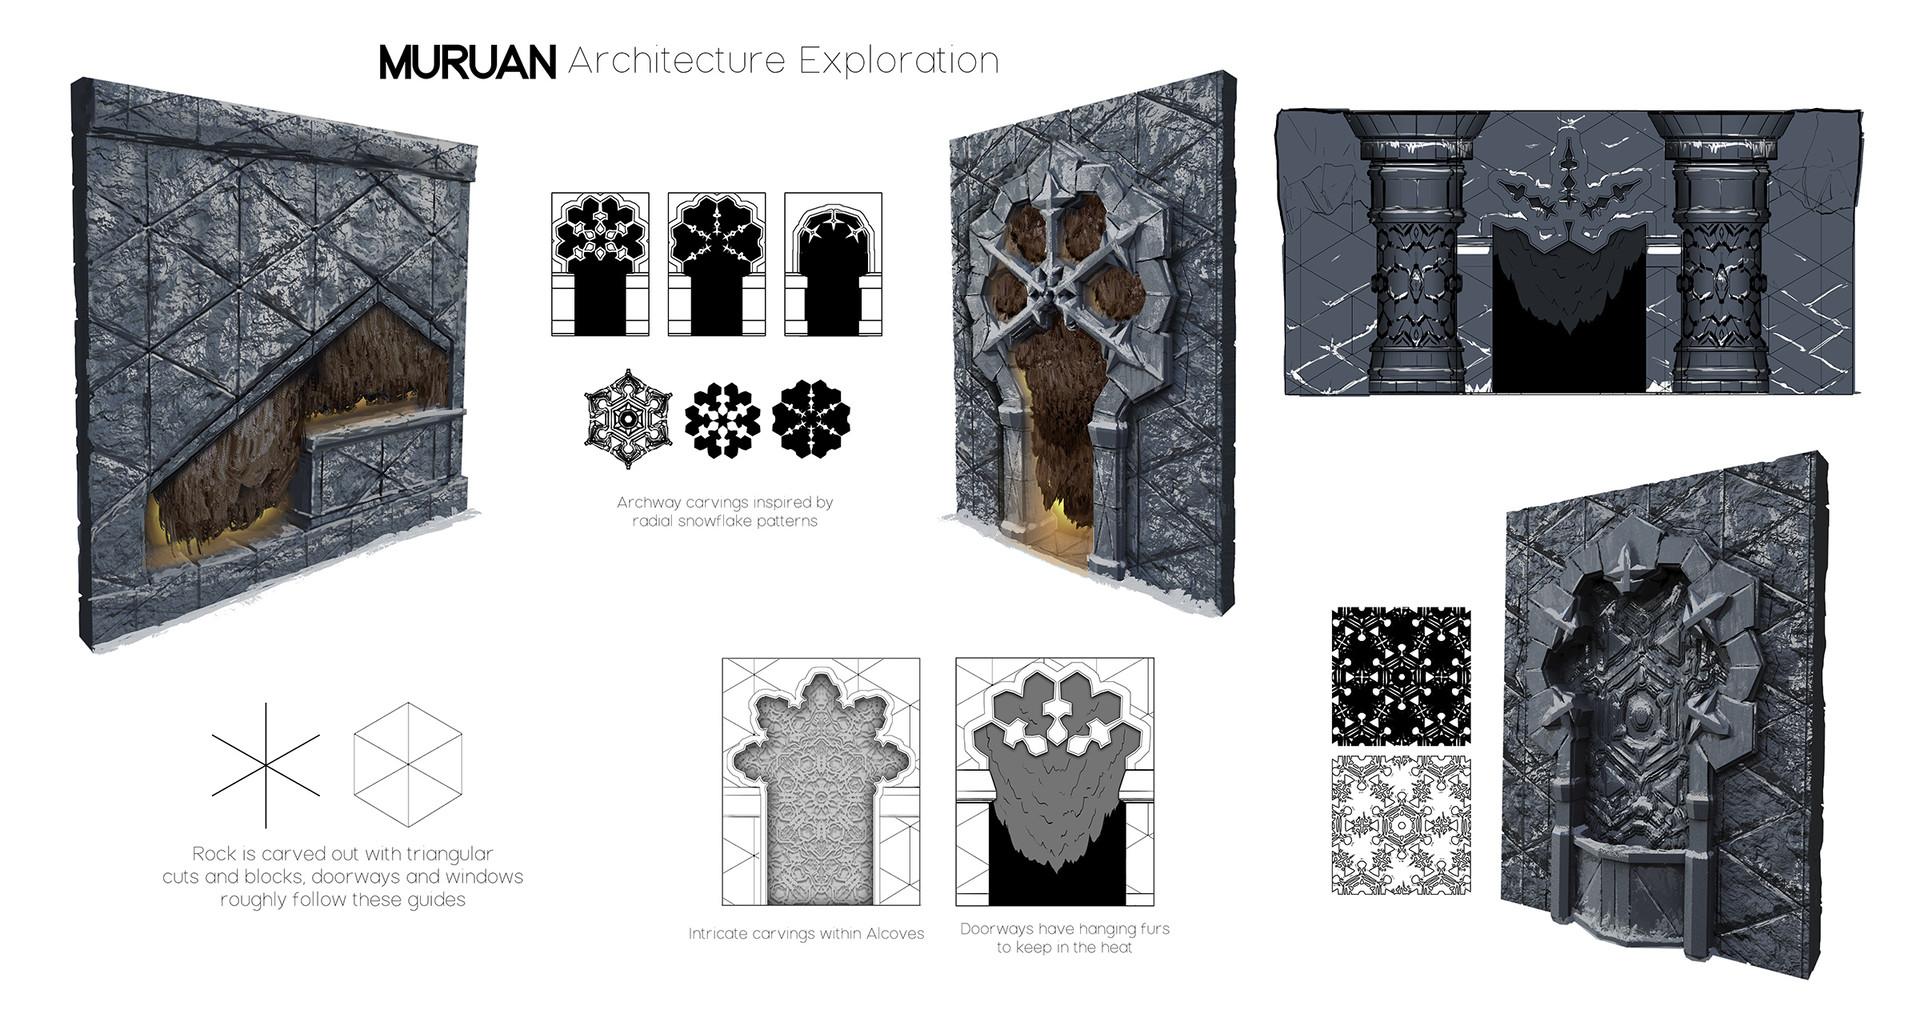 Jack eaves kobo muruan architecture motif 01